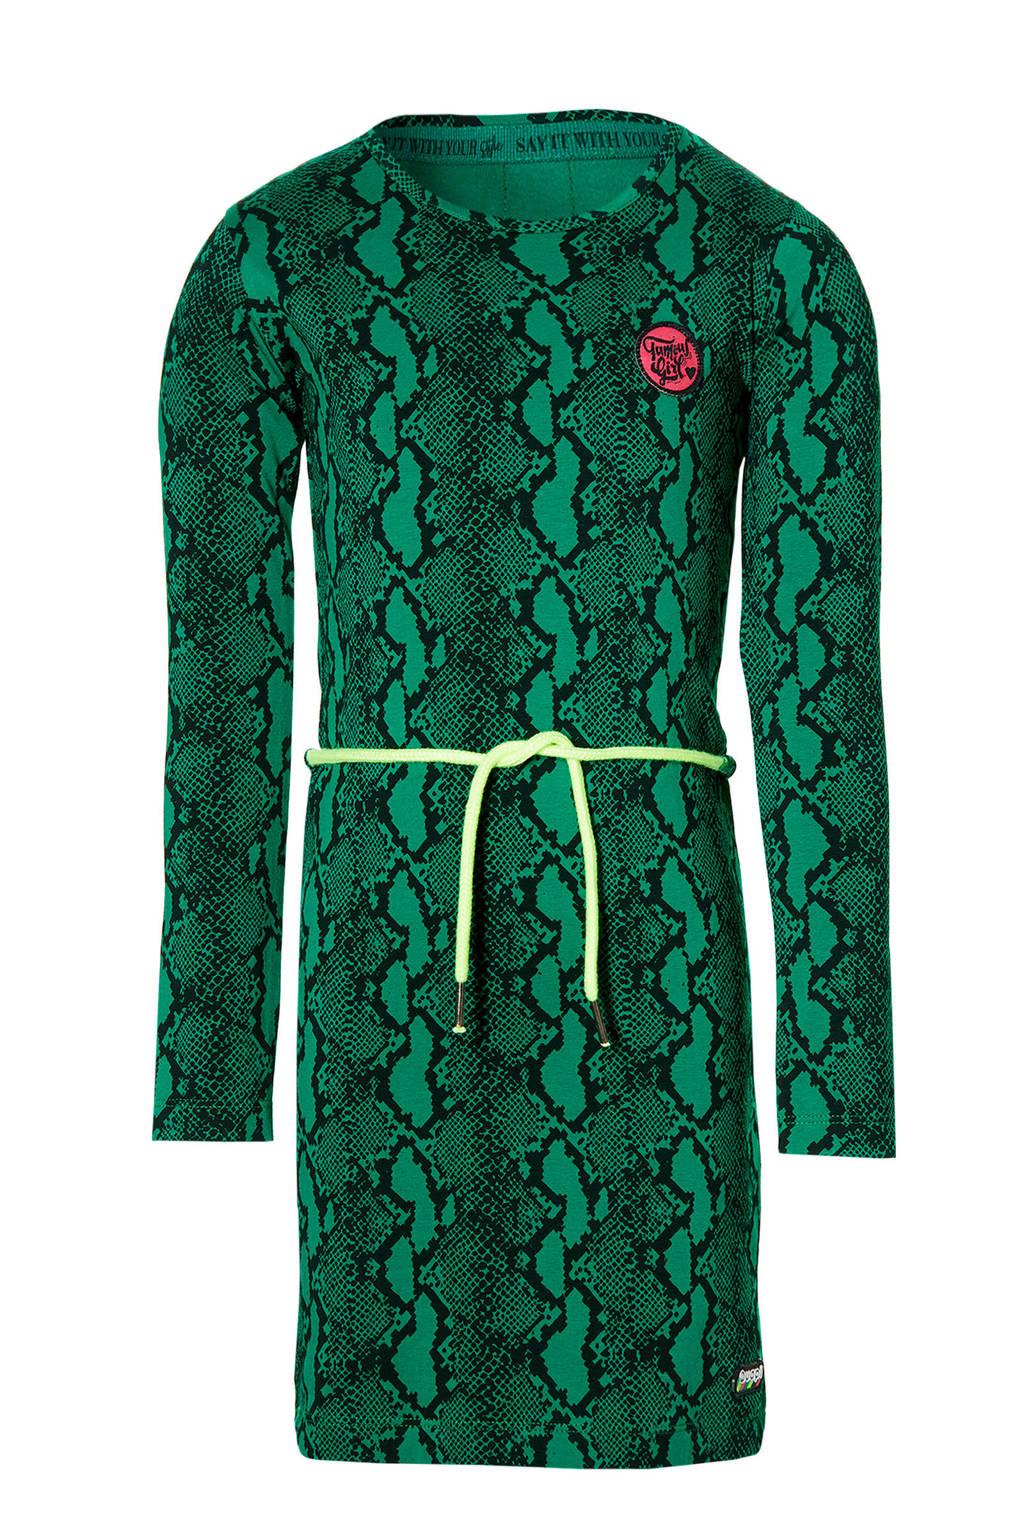 Quapi Girls T-shirtjurk Daantje met slangenprint groen/zwart, Groen/zwart